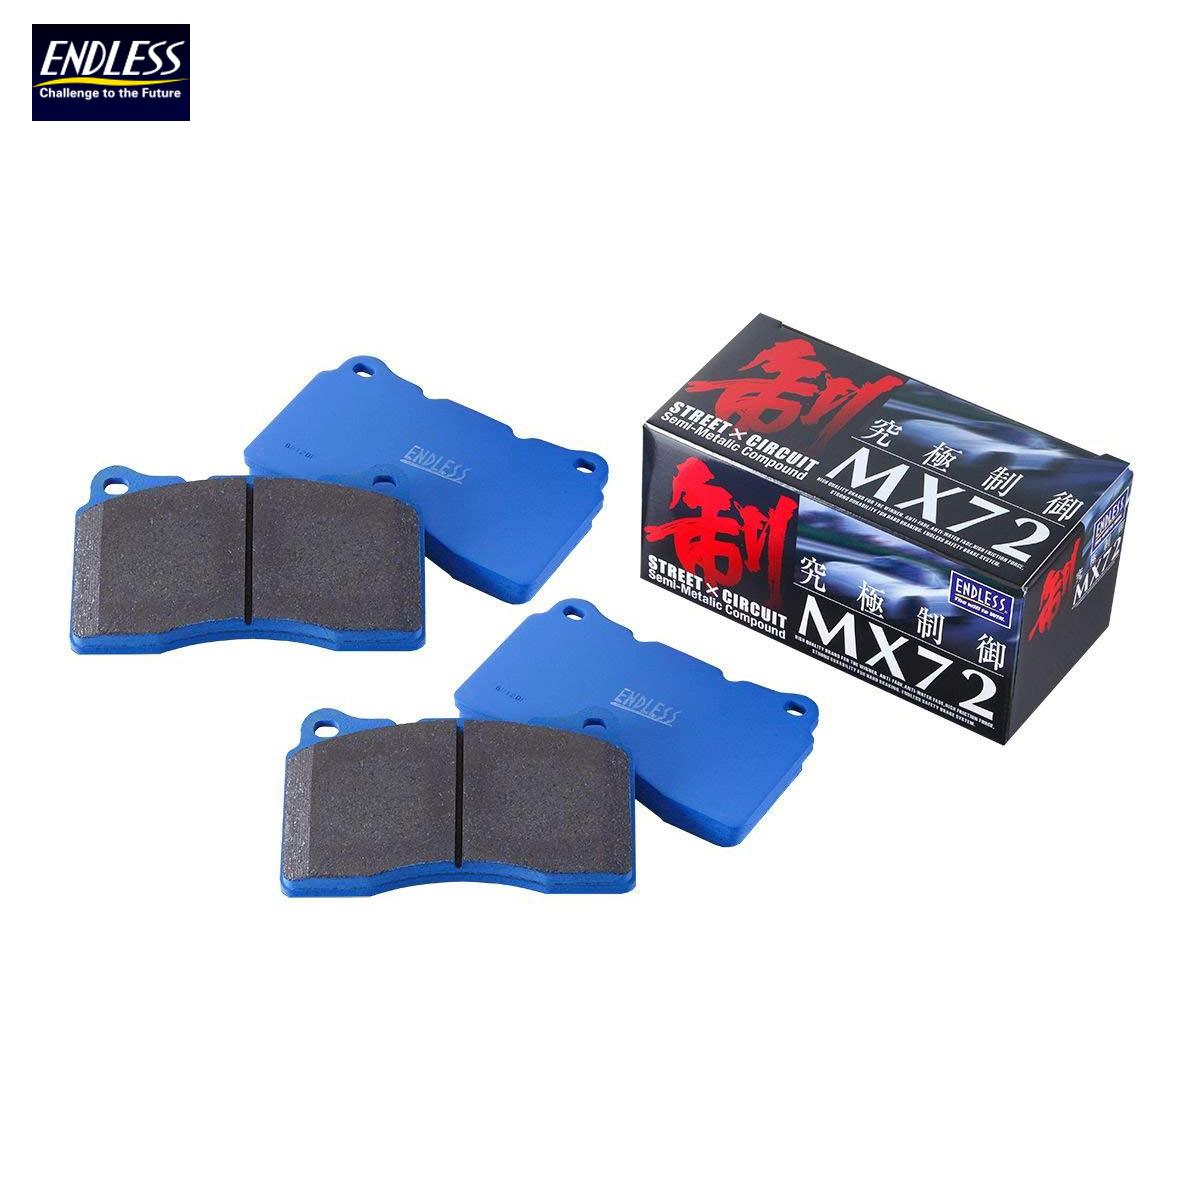 ENDLESS エンドレス ブレーキパッド MX72 リア EP443 ヴェルファイア G's ANH20W GGH20W